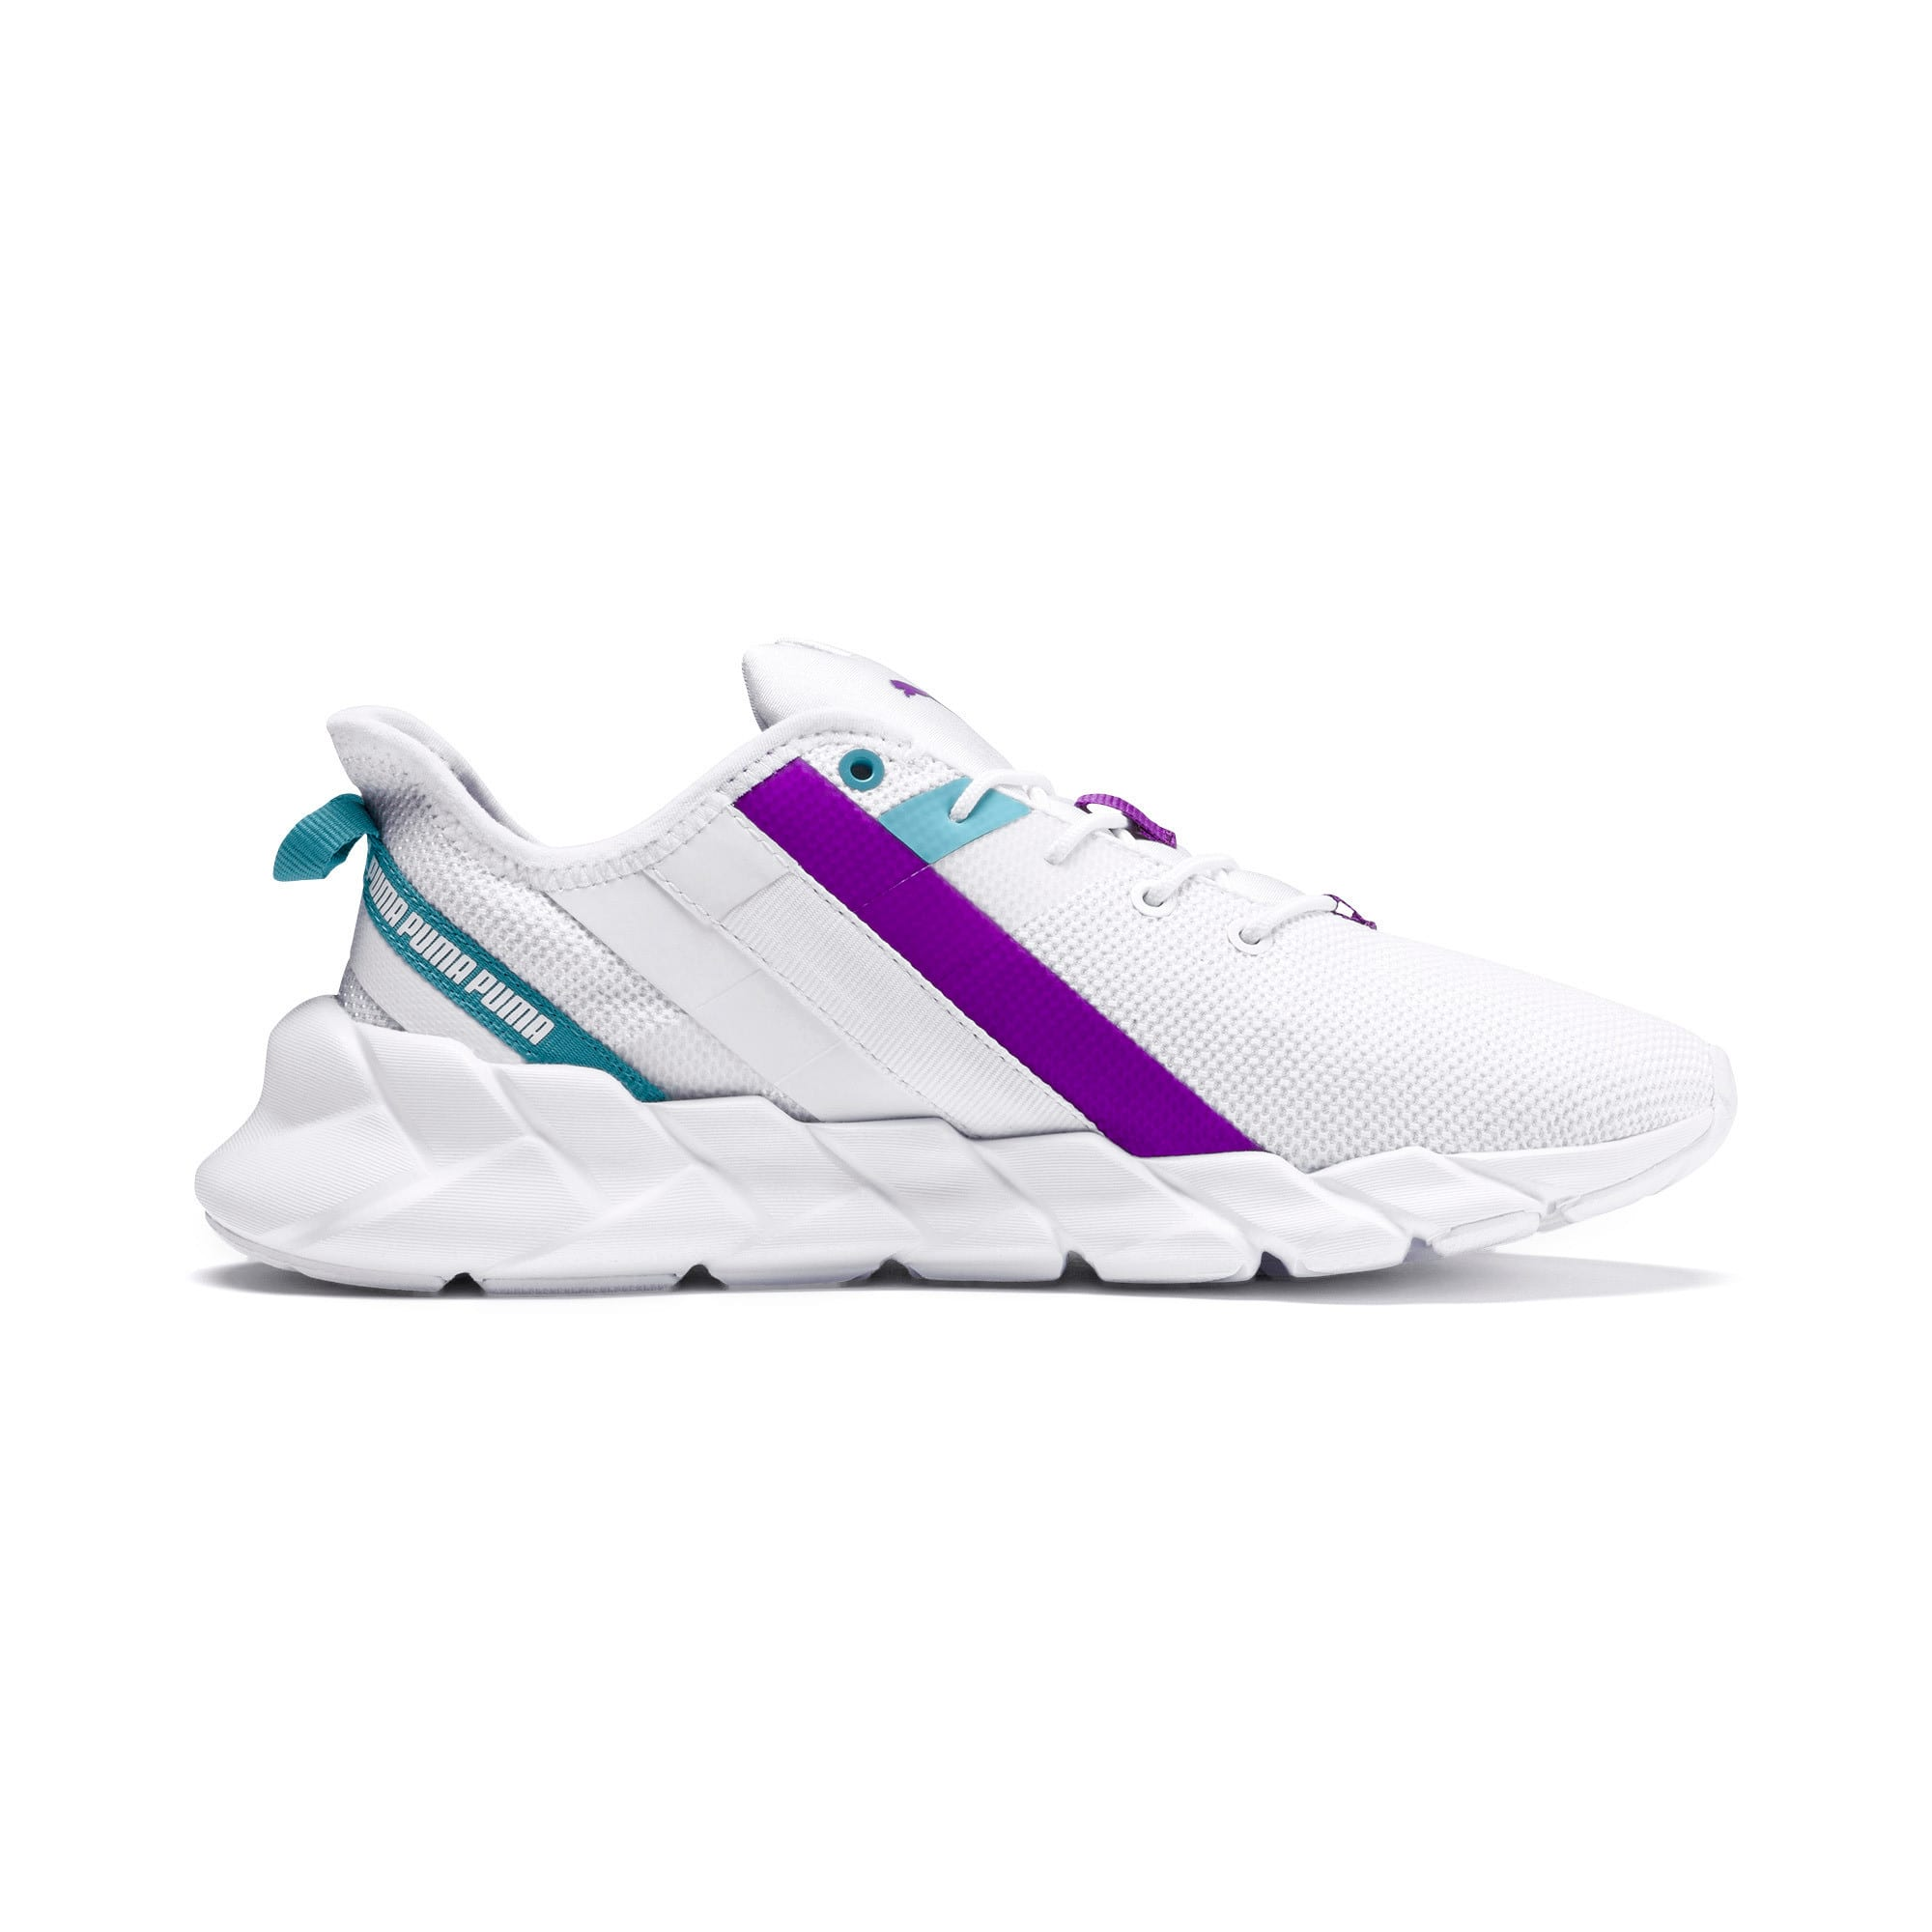 Thumbnail 5 of Weave XT Training Shoes JR, White-Milky Blue-Royal Lilac, medium